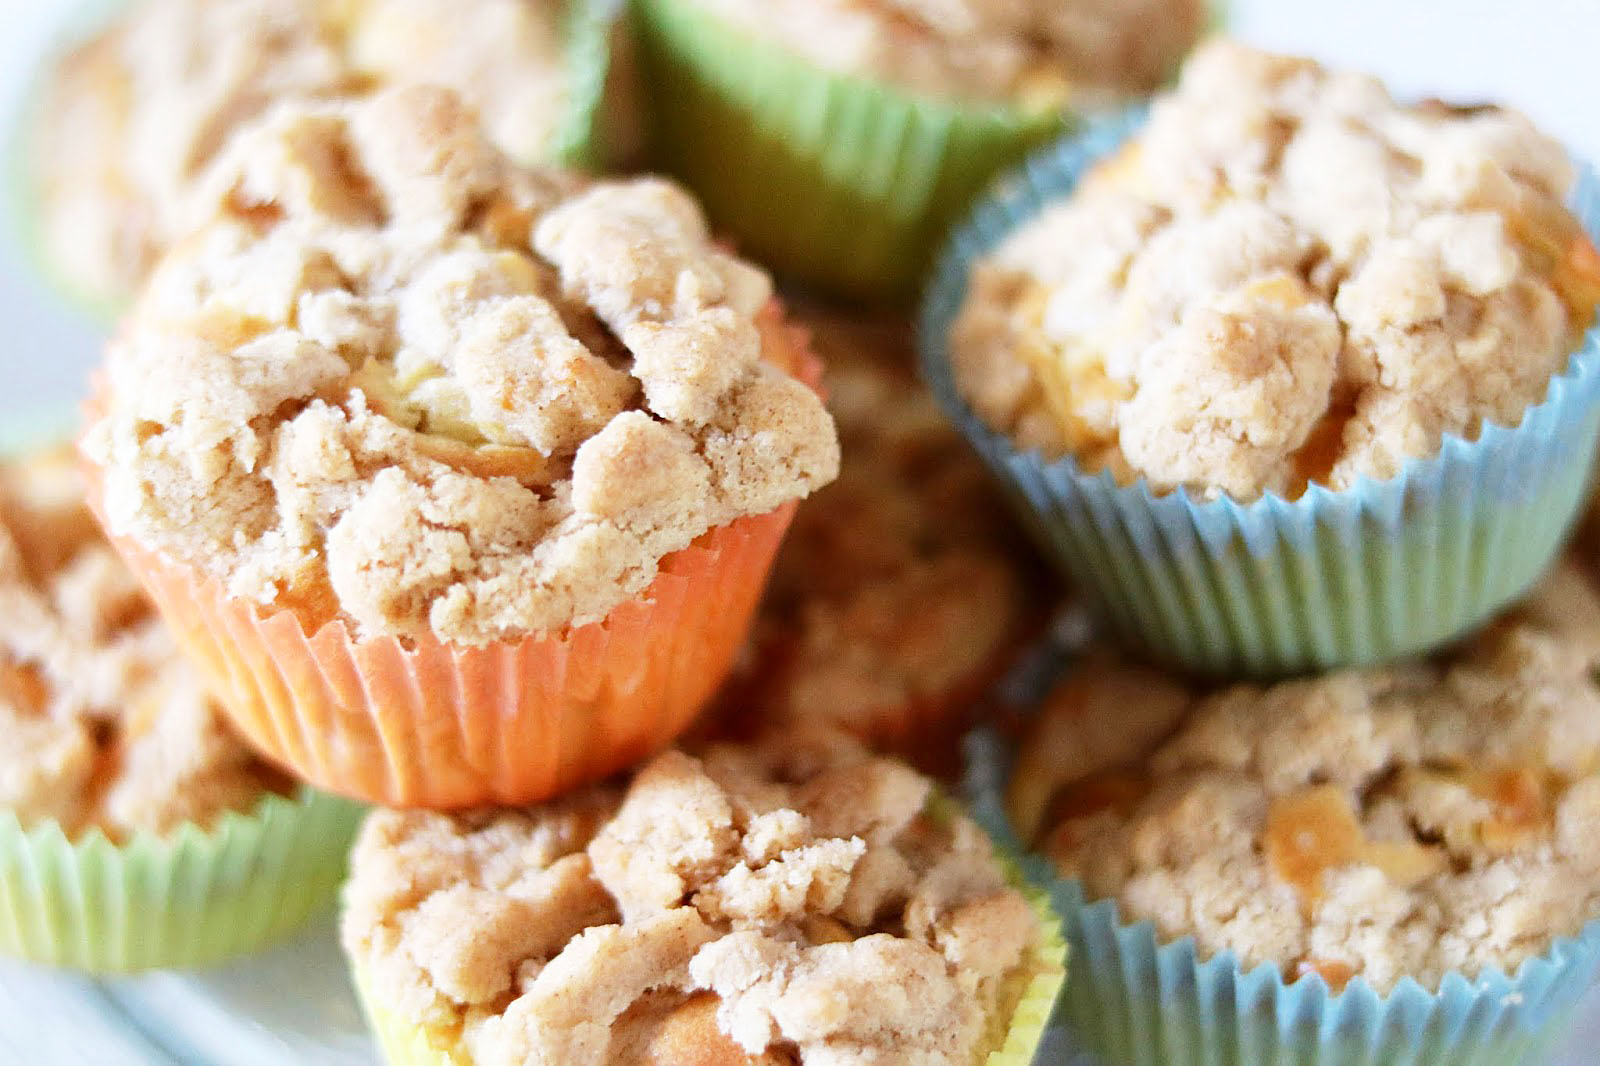 Rezept Fur Apfel Zimt Muffins Apfel Zimt Kuchen Mit Streusel